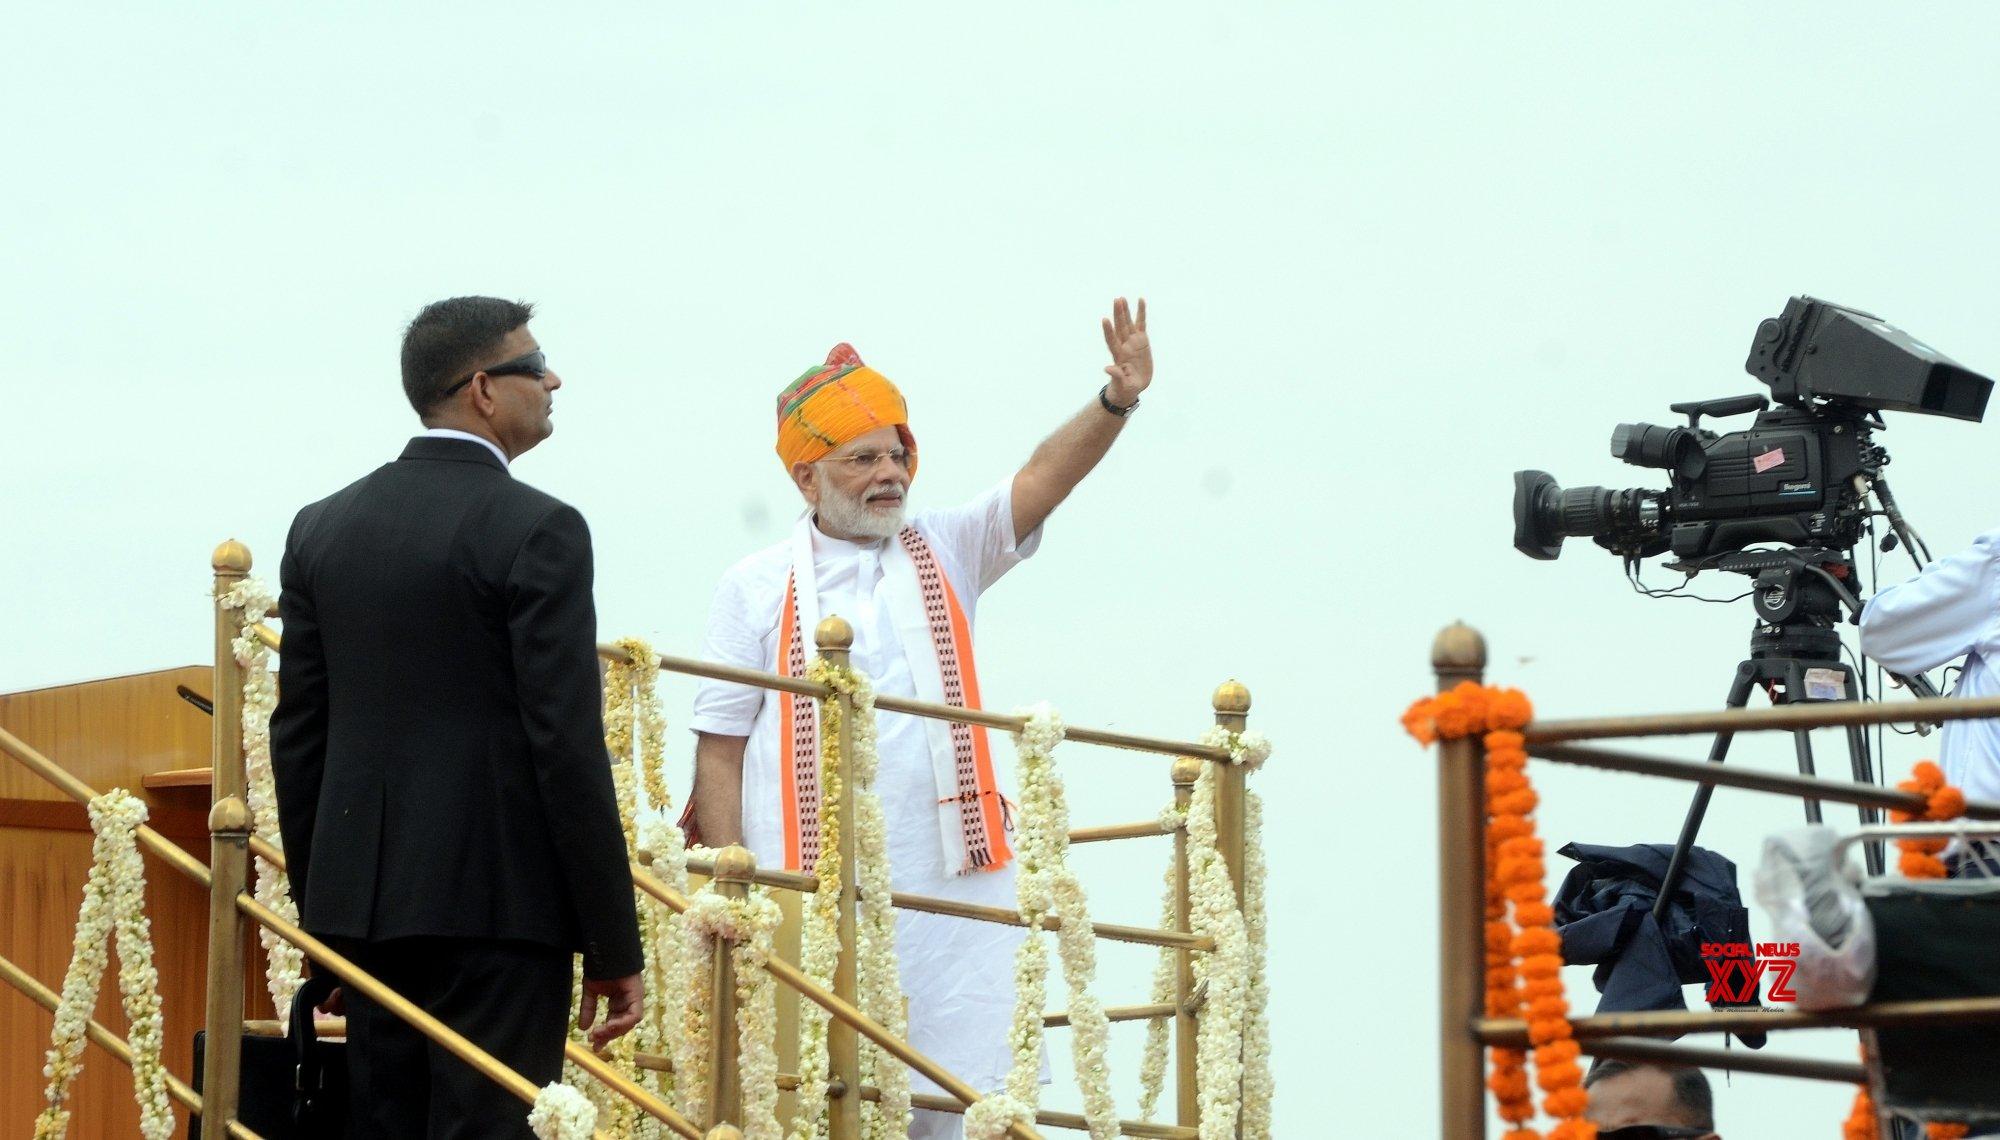 Wealth creators should not be eyed with suspicion: PM Modi